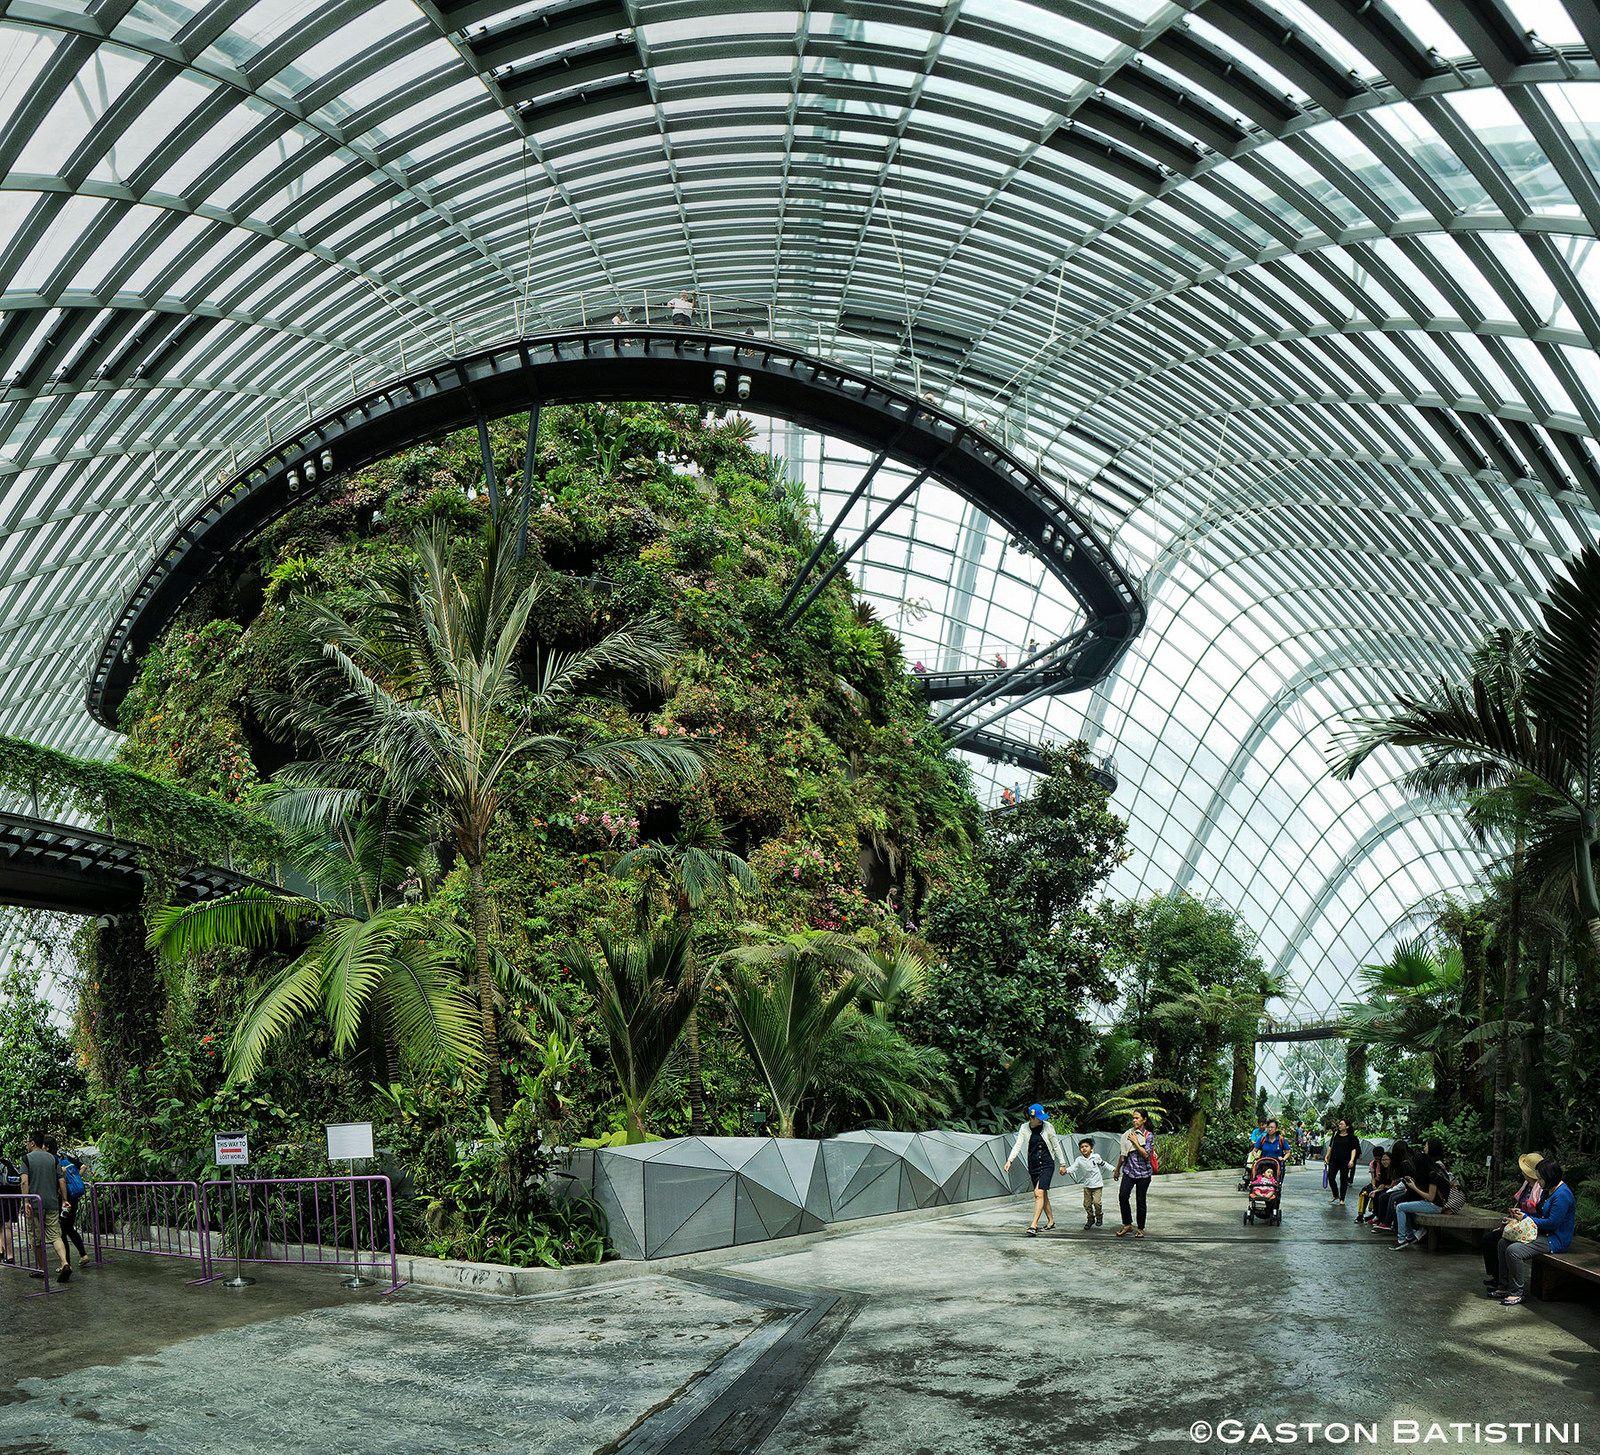 d5c37c4e9e85e652af3bb437a071a530 - Gardens By The Bay Landscape Architect